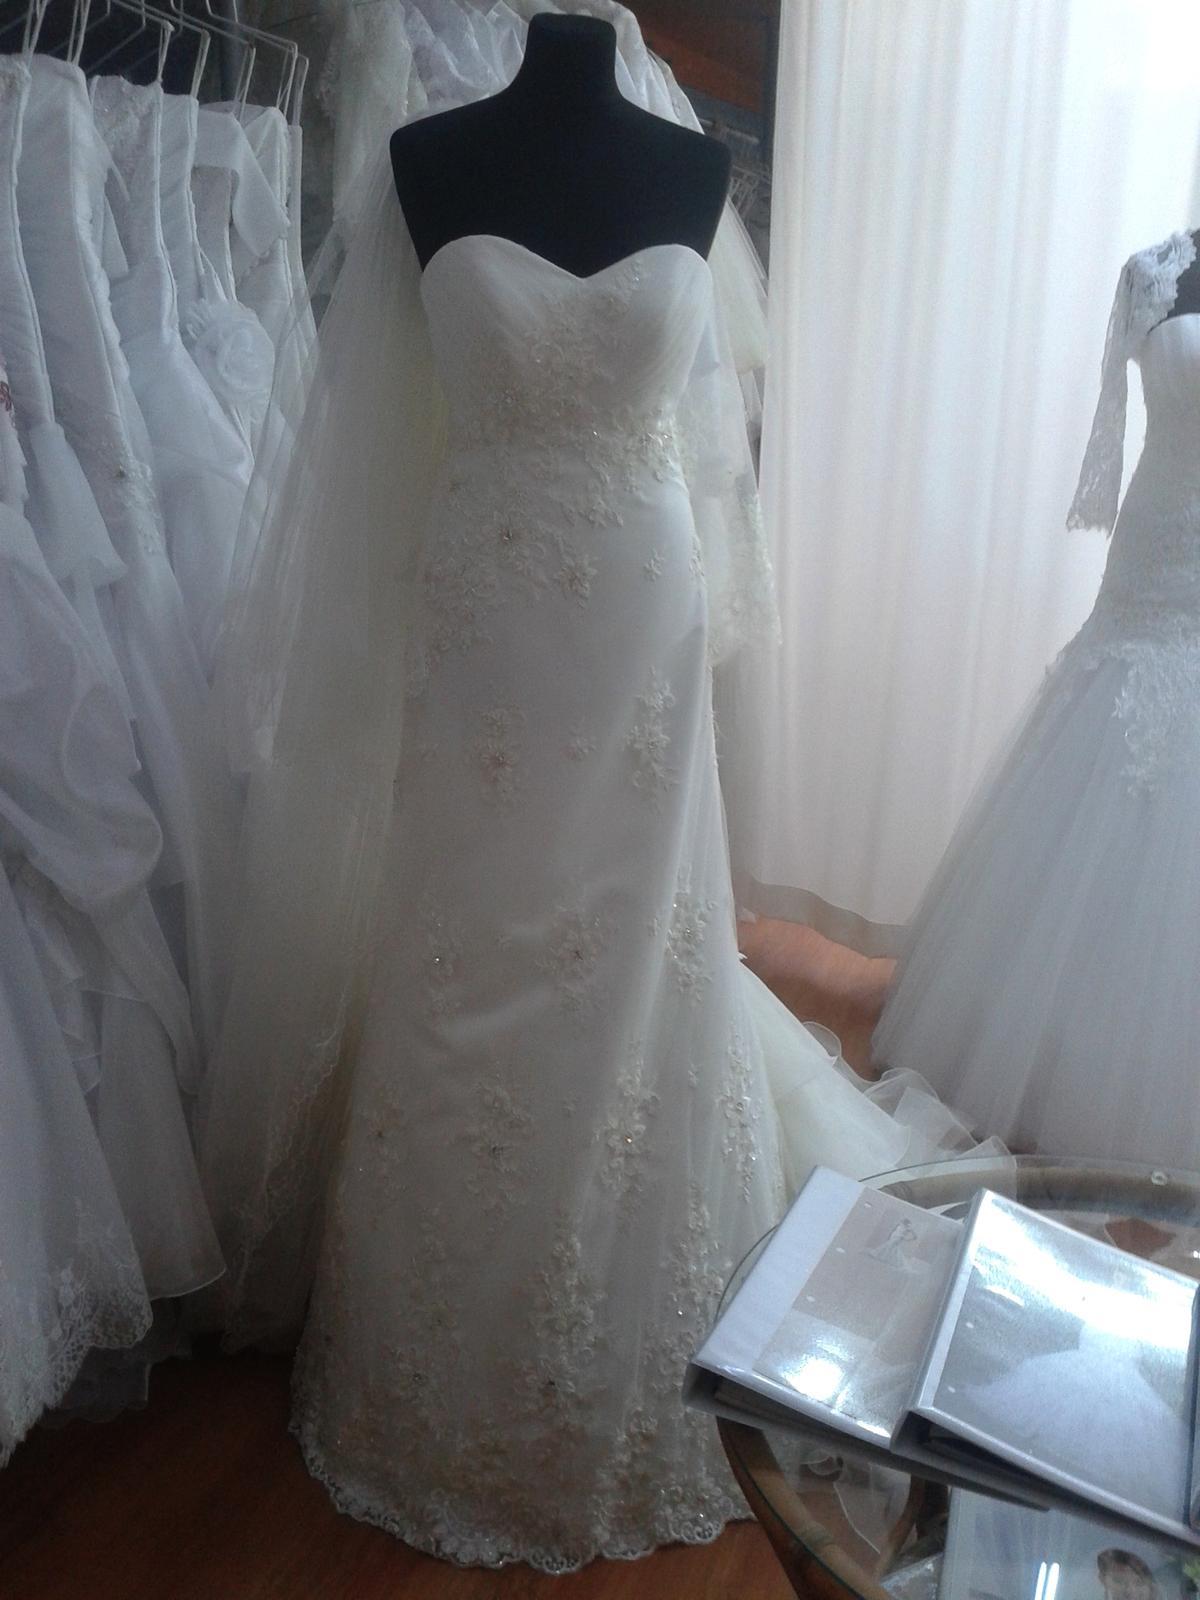 Naša romantic-rustic svadba ♥ - Najbližšie mojej predstave :)